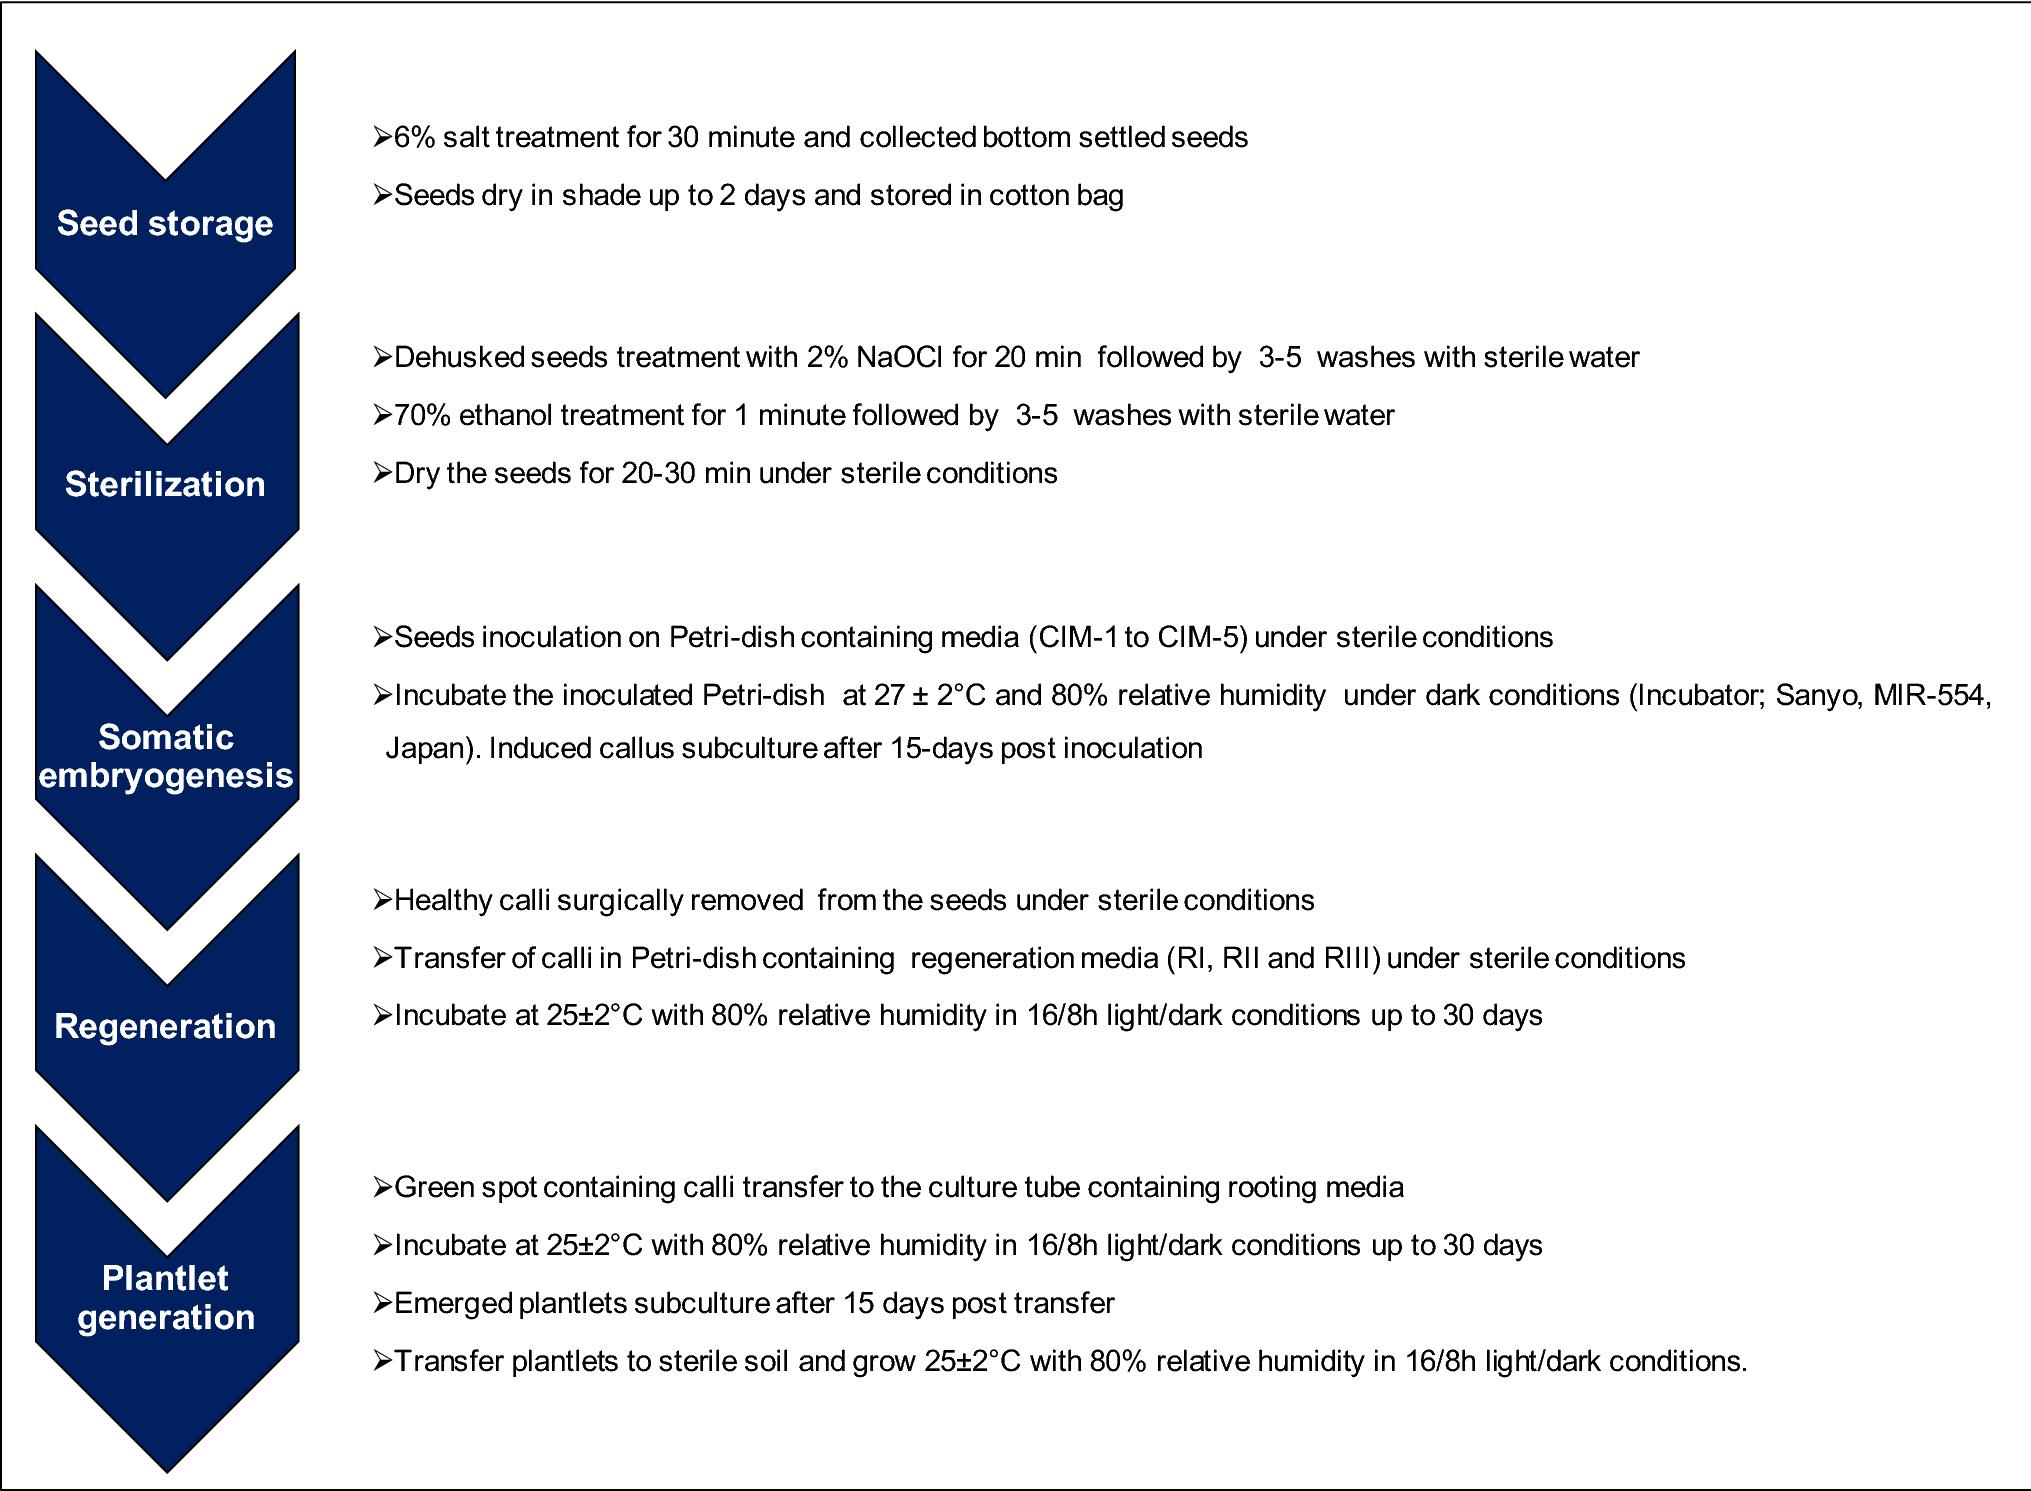 Optimization of in vitro culture media for improvement in